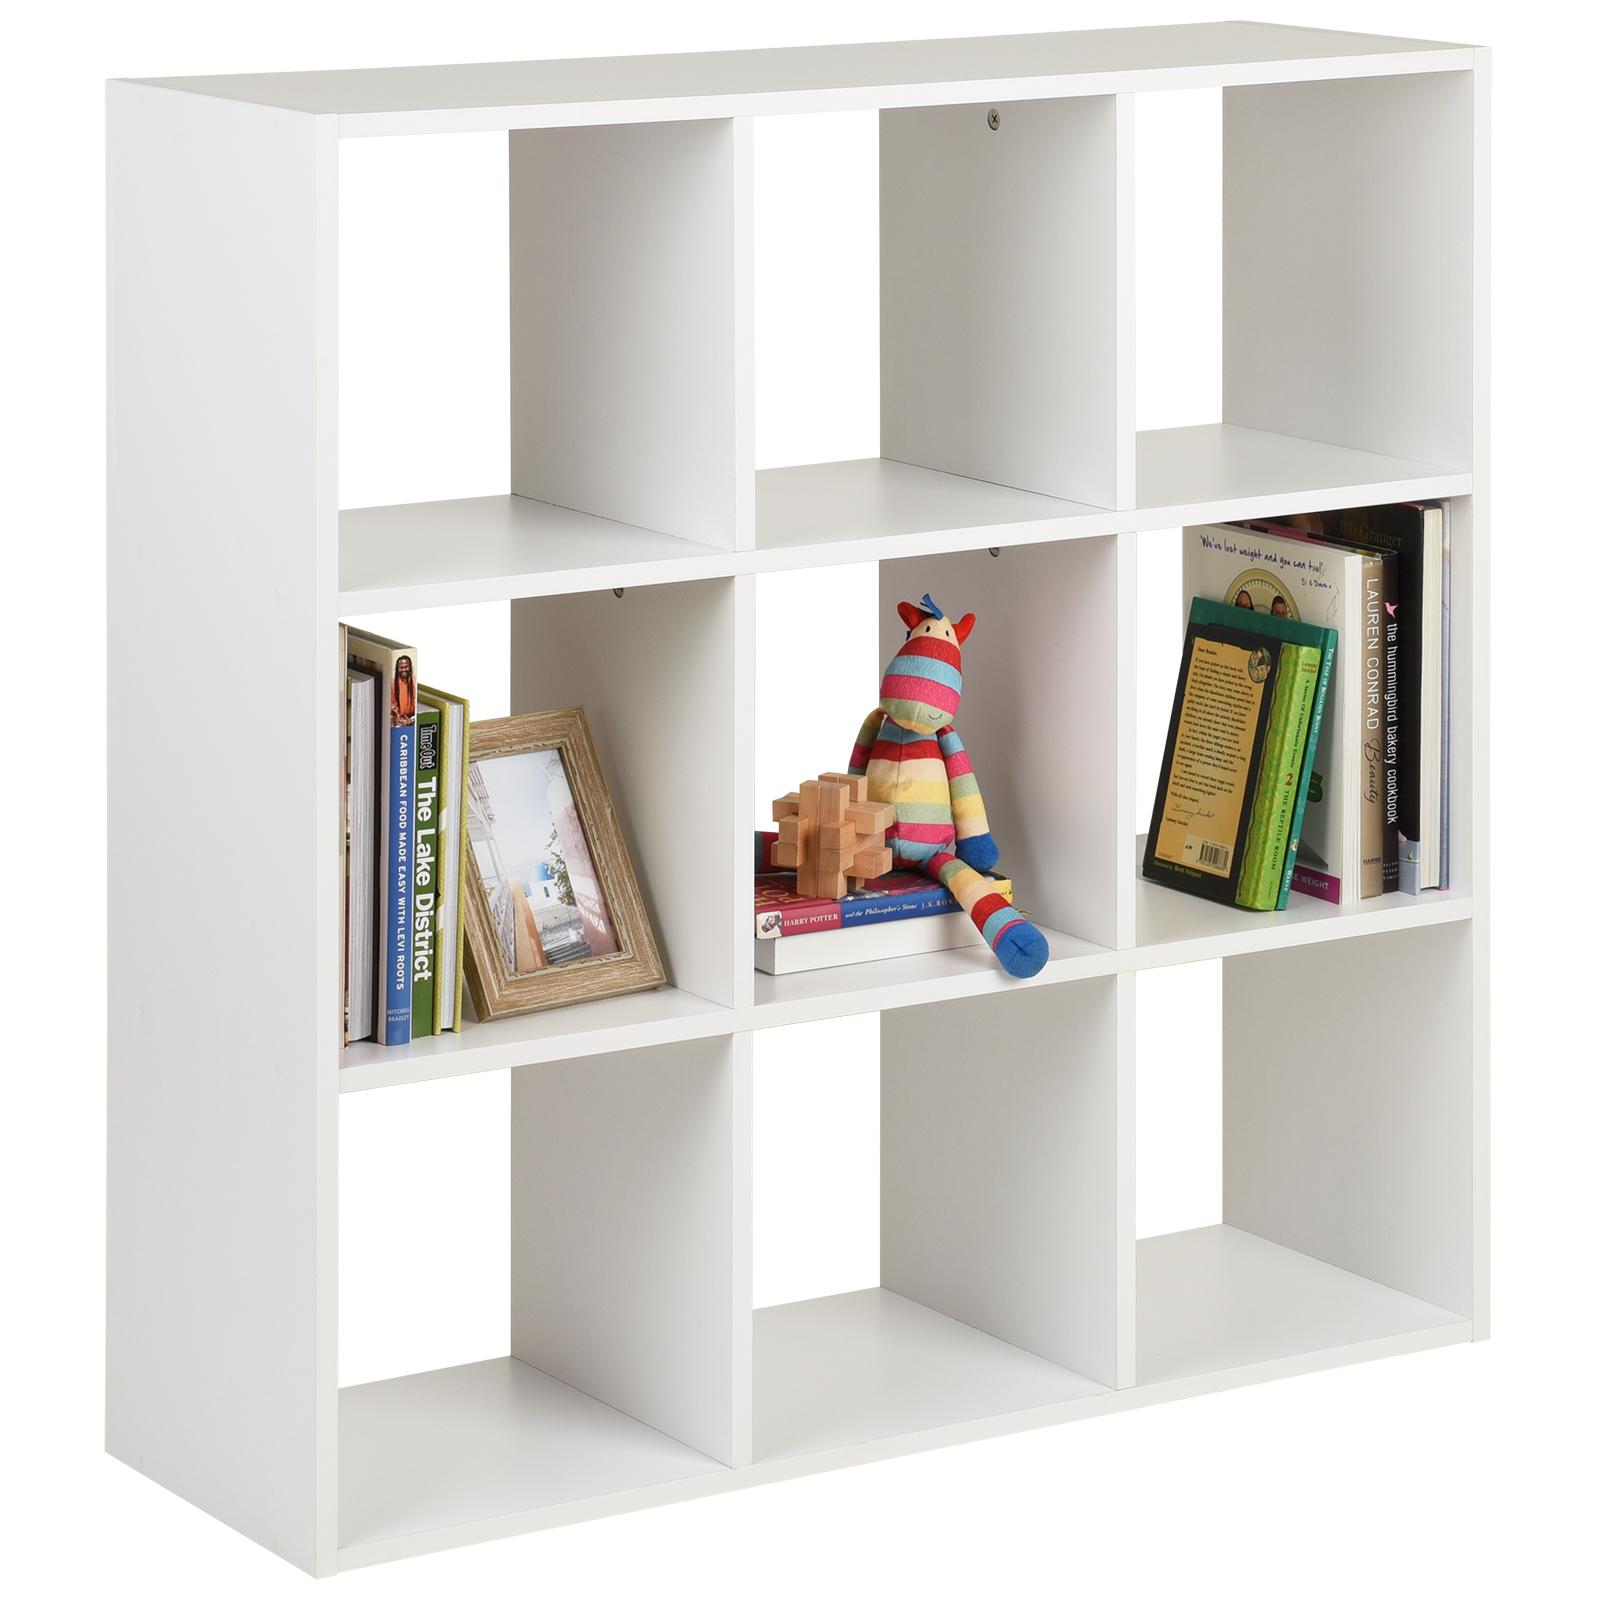 Scaffali Libreria Bianchi.Dettagli Su Hartleys Scaffali Scaffale Libreria Bianchi Con 9 Cubi Ripiani Moderno Mobili